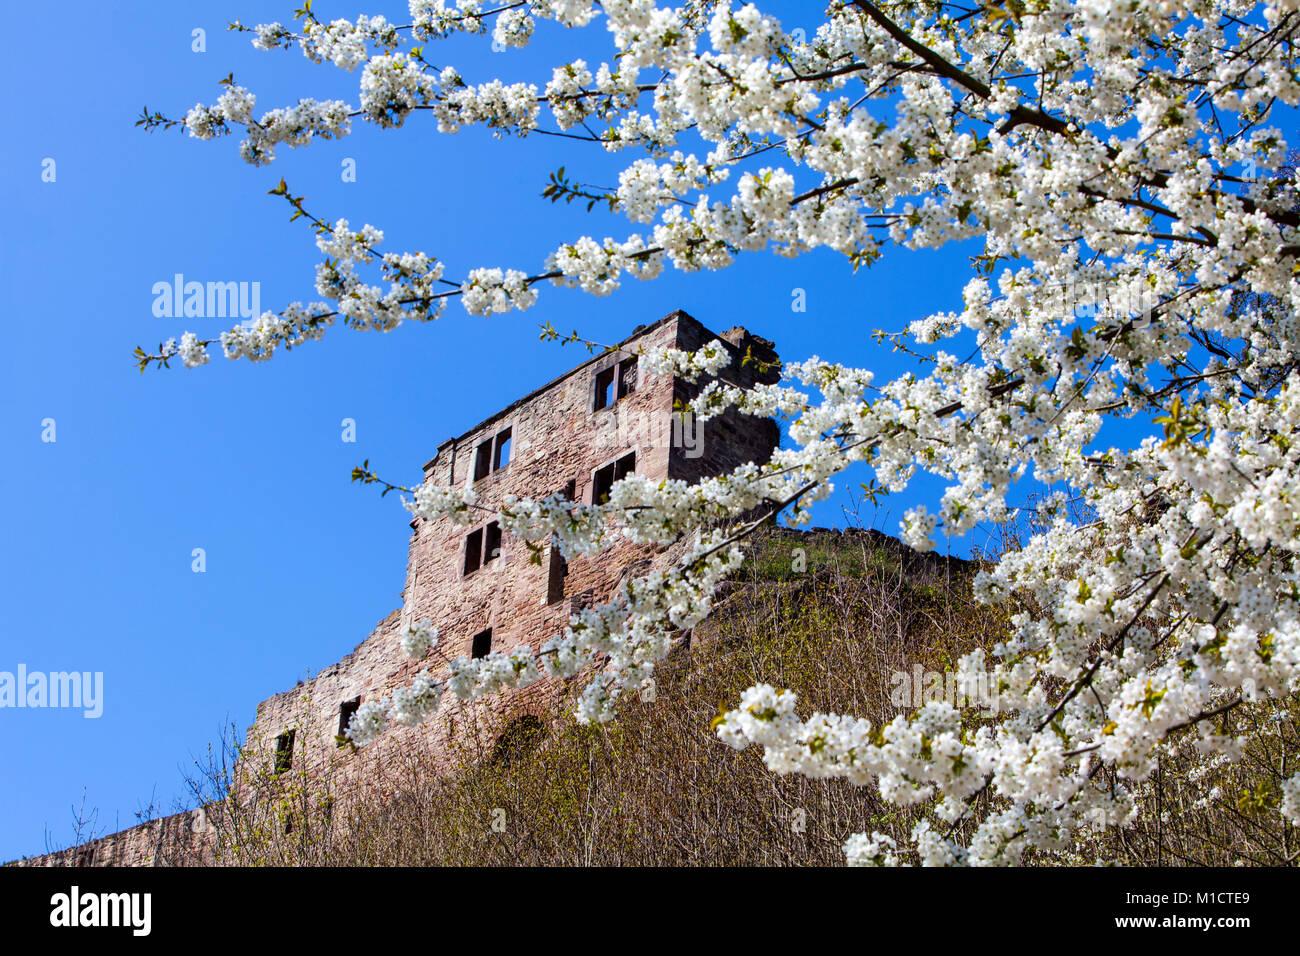 Hardenberg Castle, ruin near Nörten-Hardenberg, district of Northeim, Lower Saxony, Germany - Stock Image